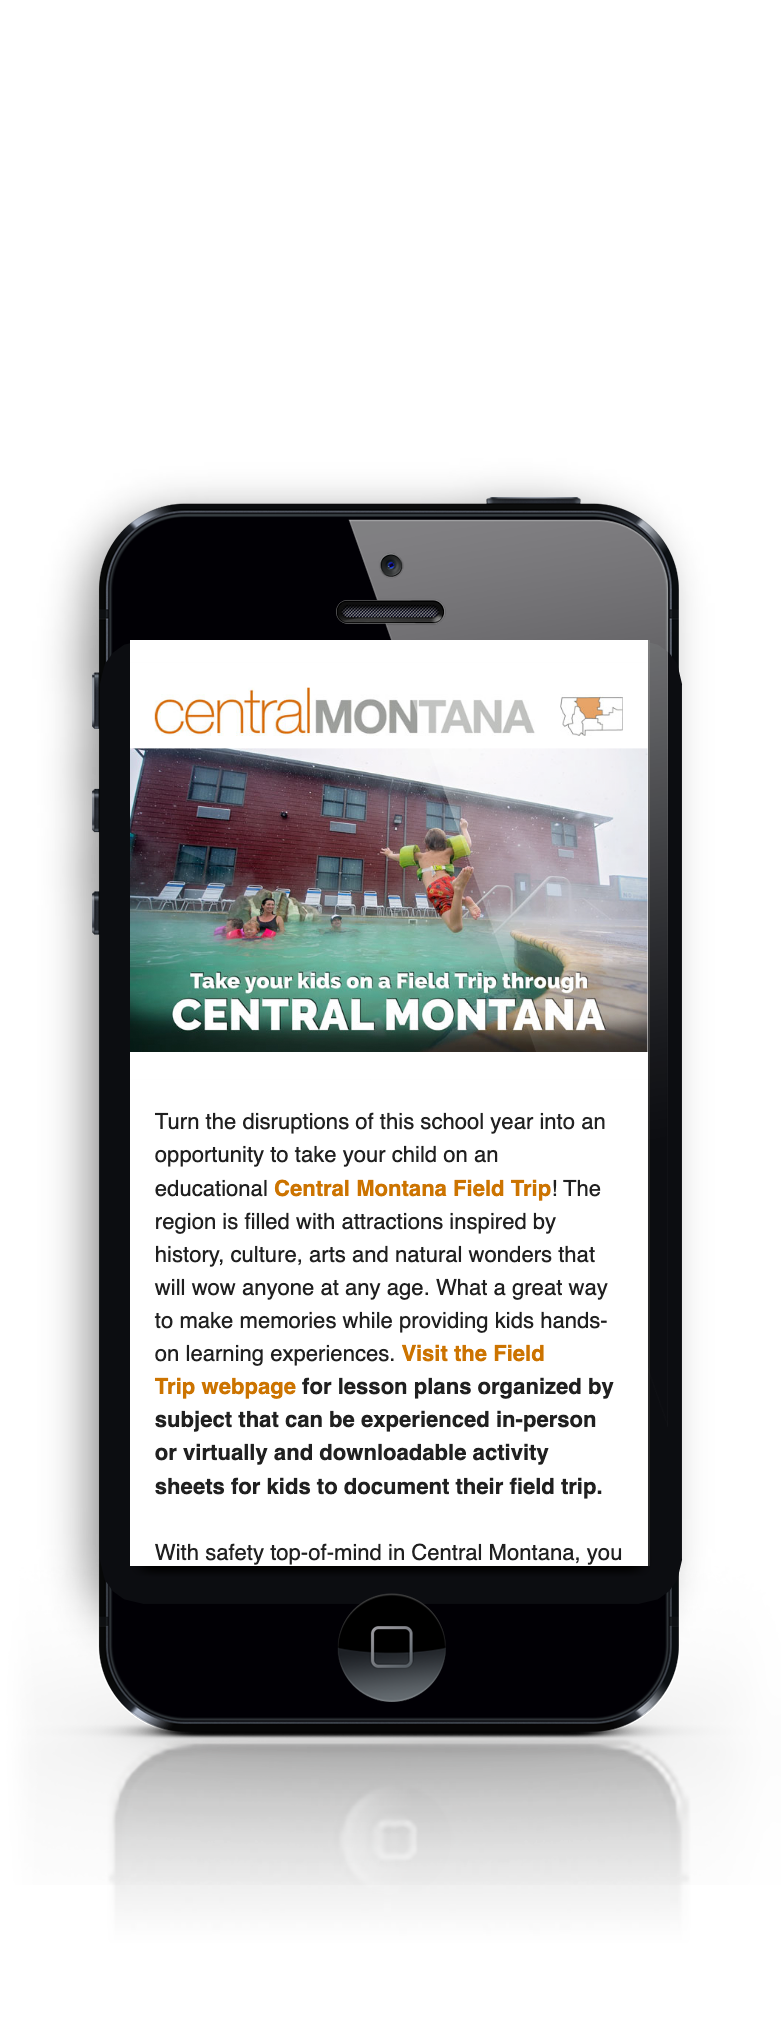 Central Montana html on a phone